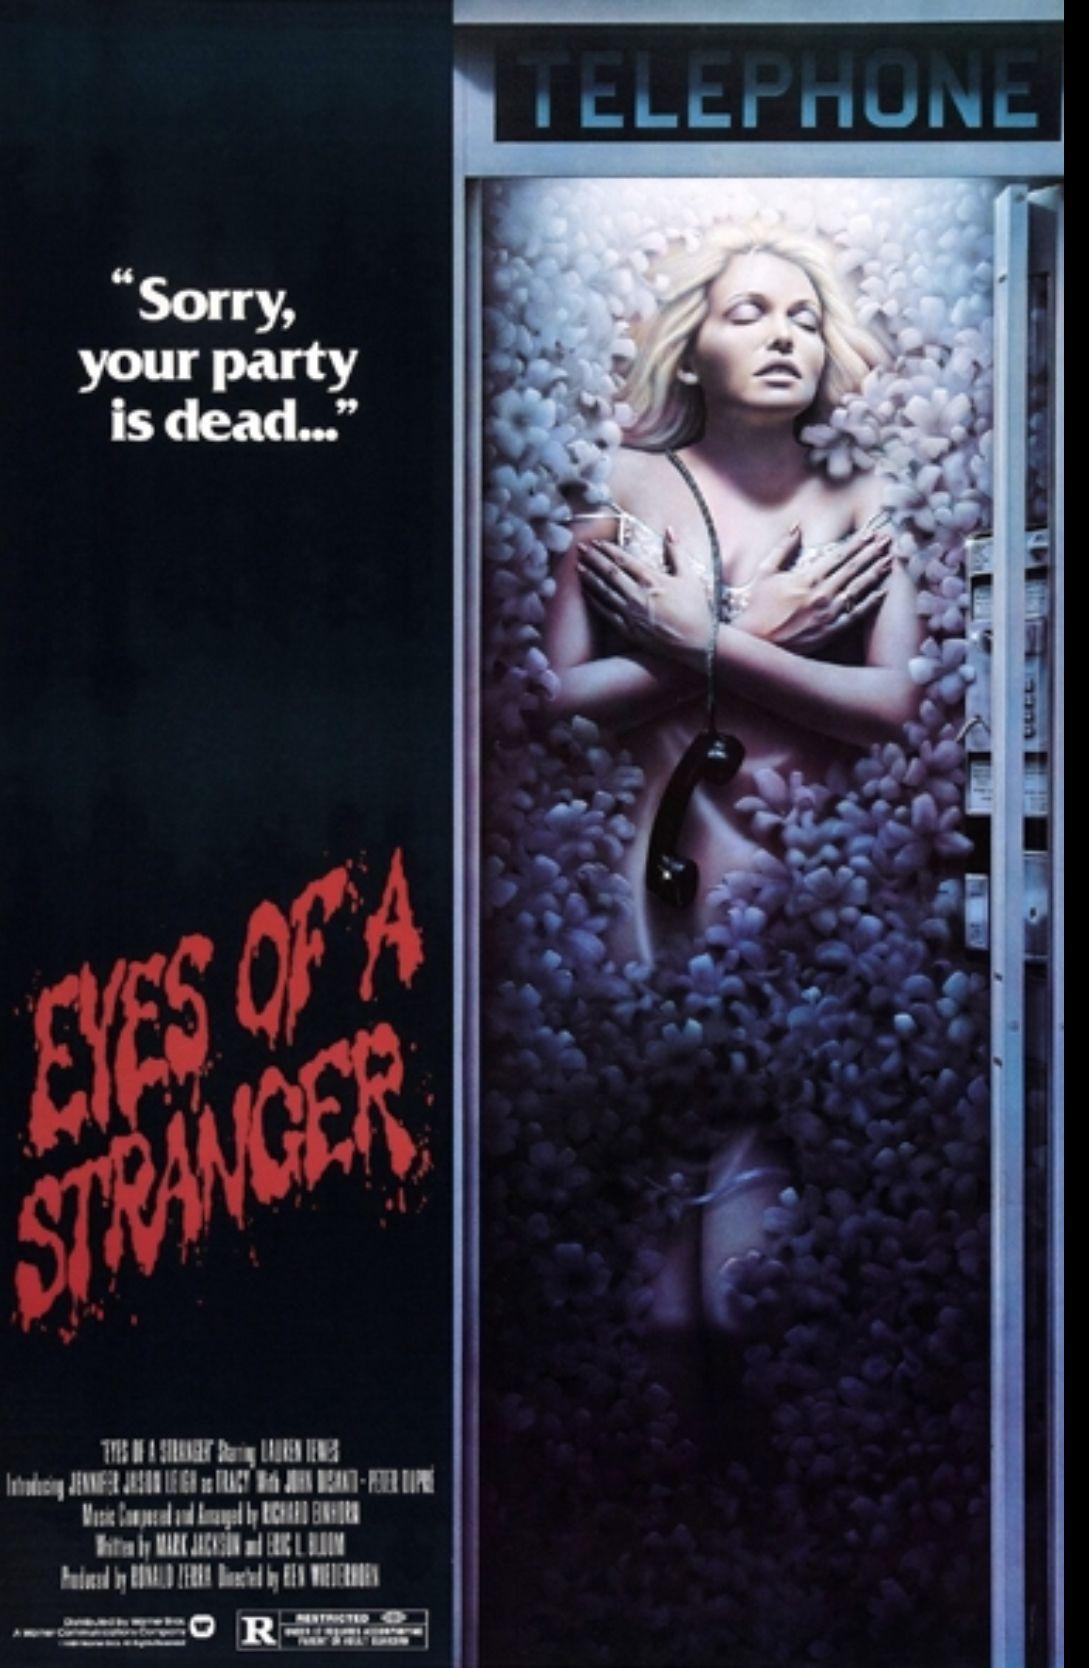 Eyes of a Stranger | The stranger movie, Horror movie posters, Movie ...